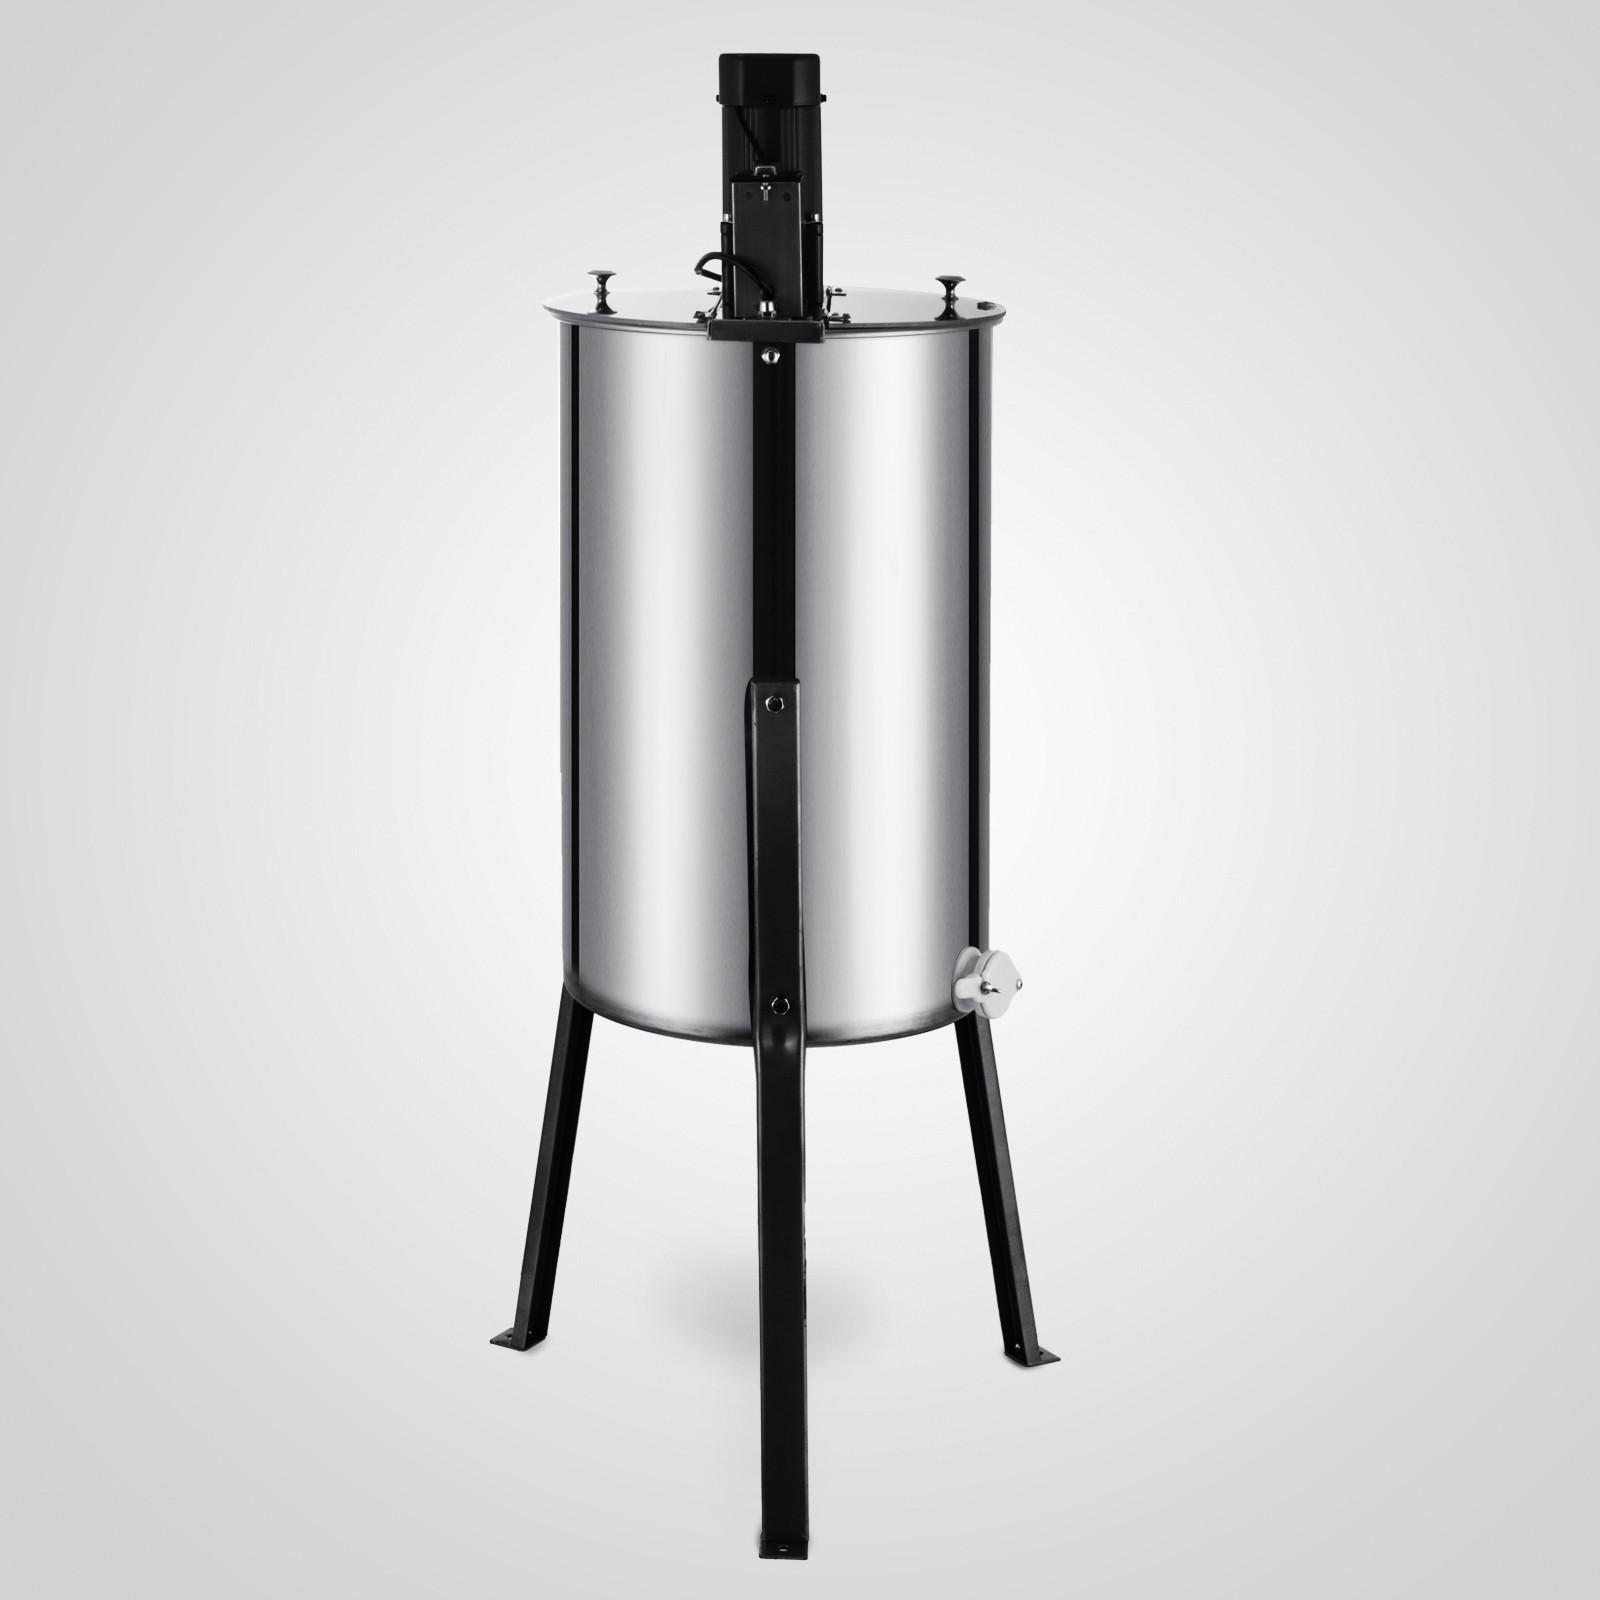 Extracteur-de-Miel-Electrique-manuelle-2-3-4-Cadres-En-Acier-Inox-Centrifugeuse miniature 41